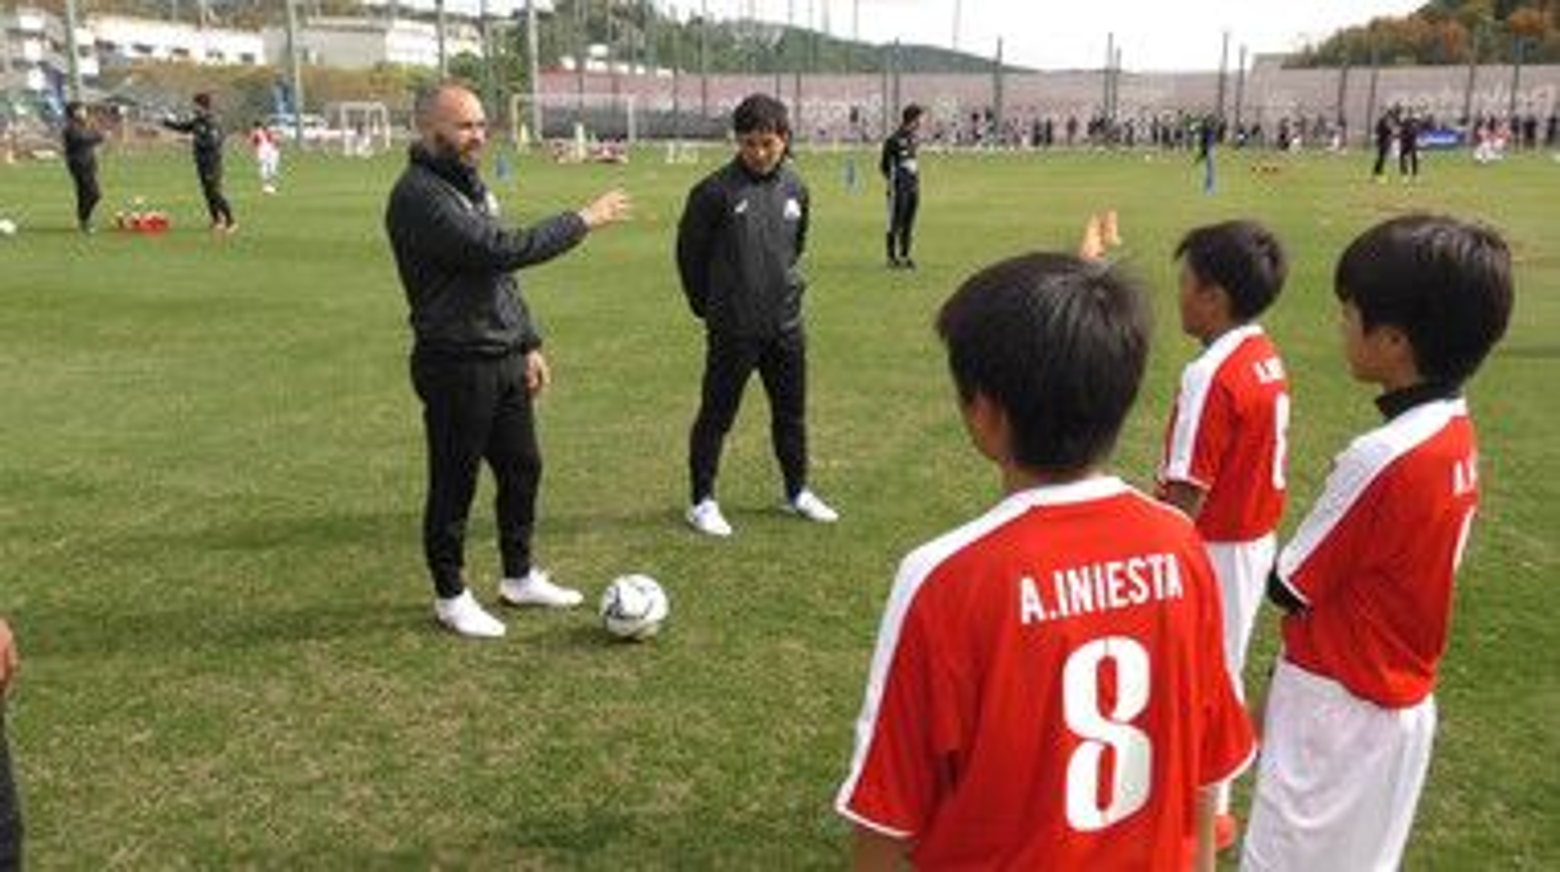 Iniesta TV: Football Lessons Episode 1: Iniesta's Methodology #1